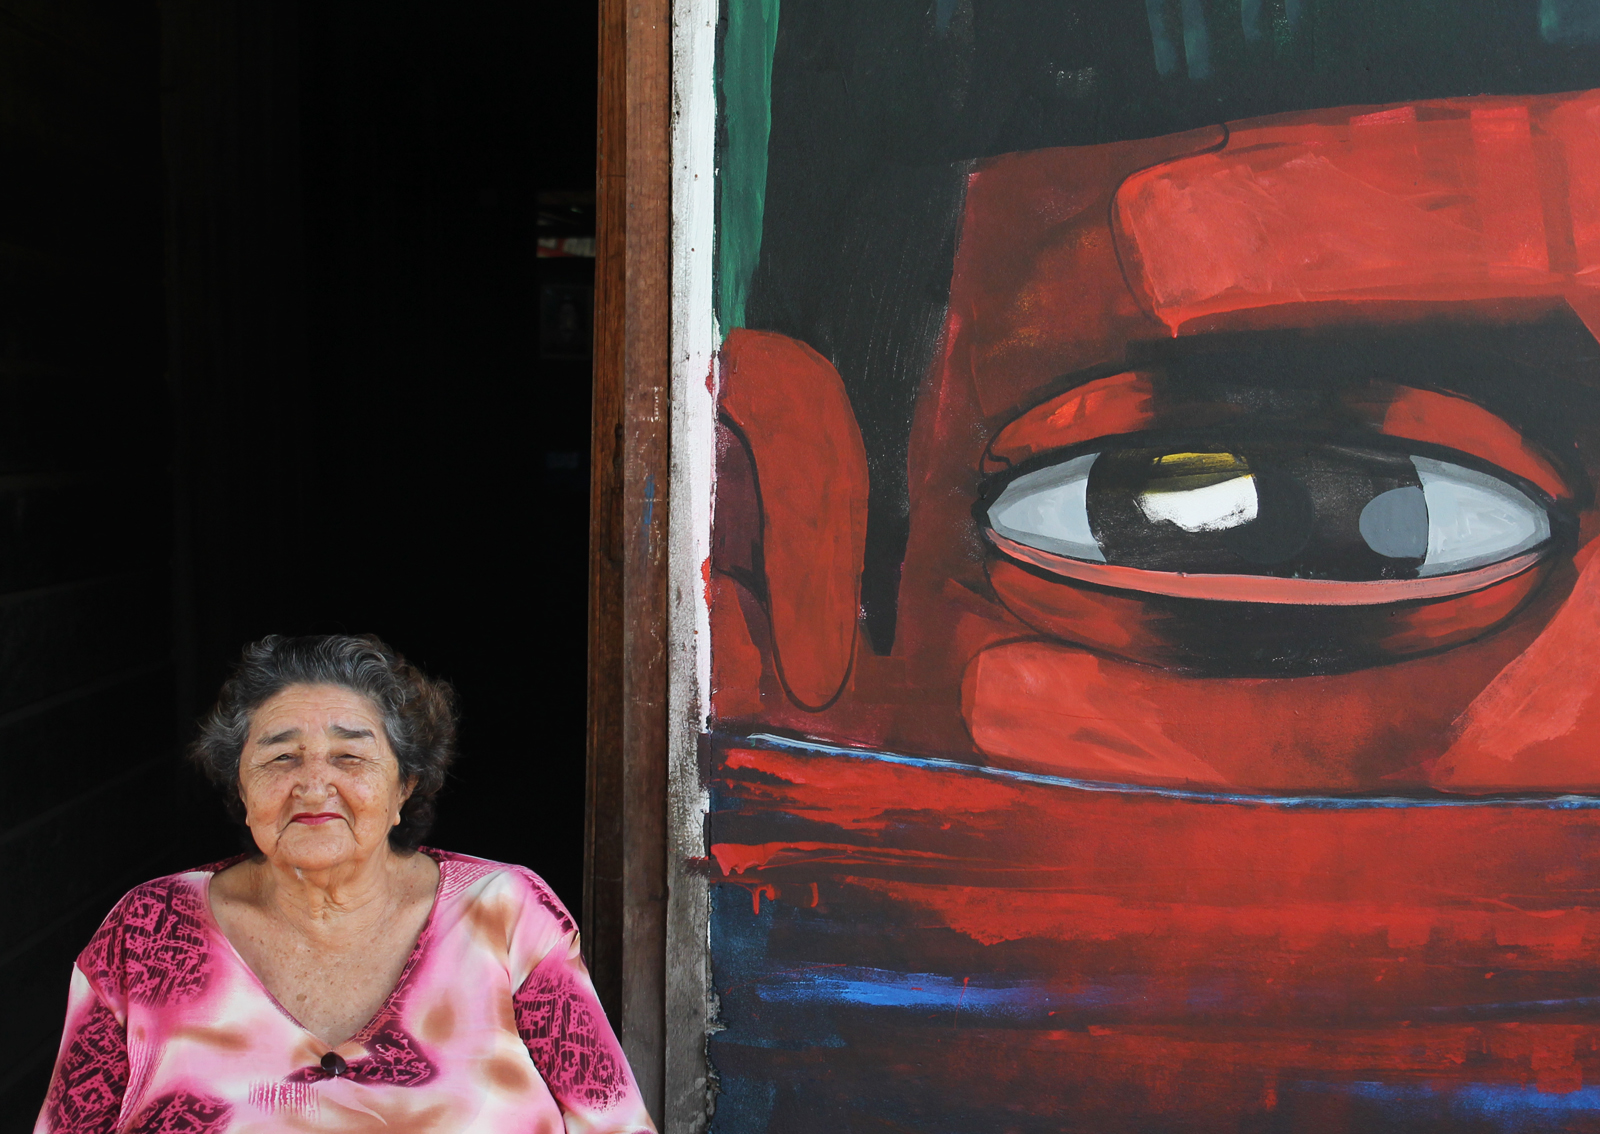 jade-flora-new-mural-in-puerto-maldonado-03